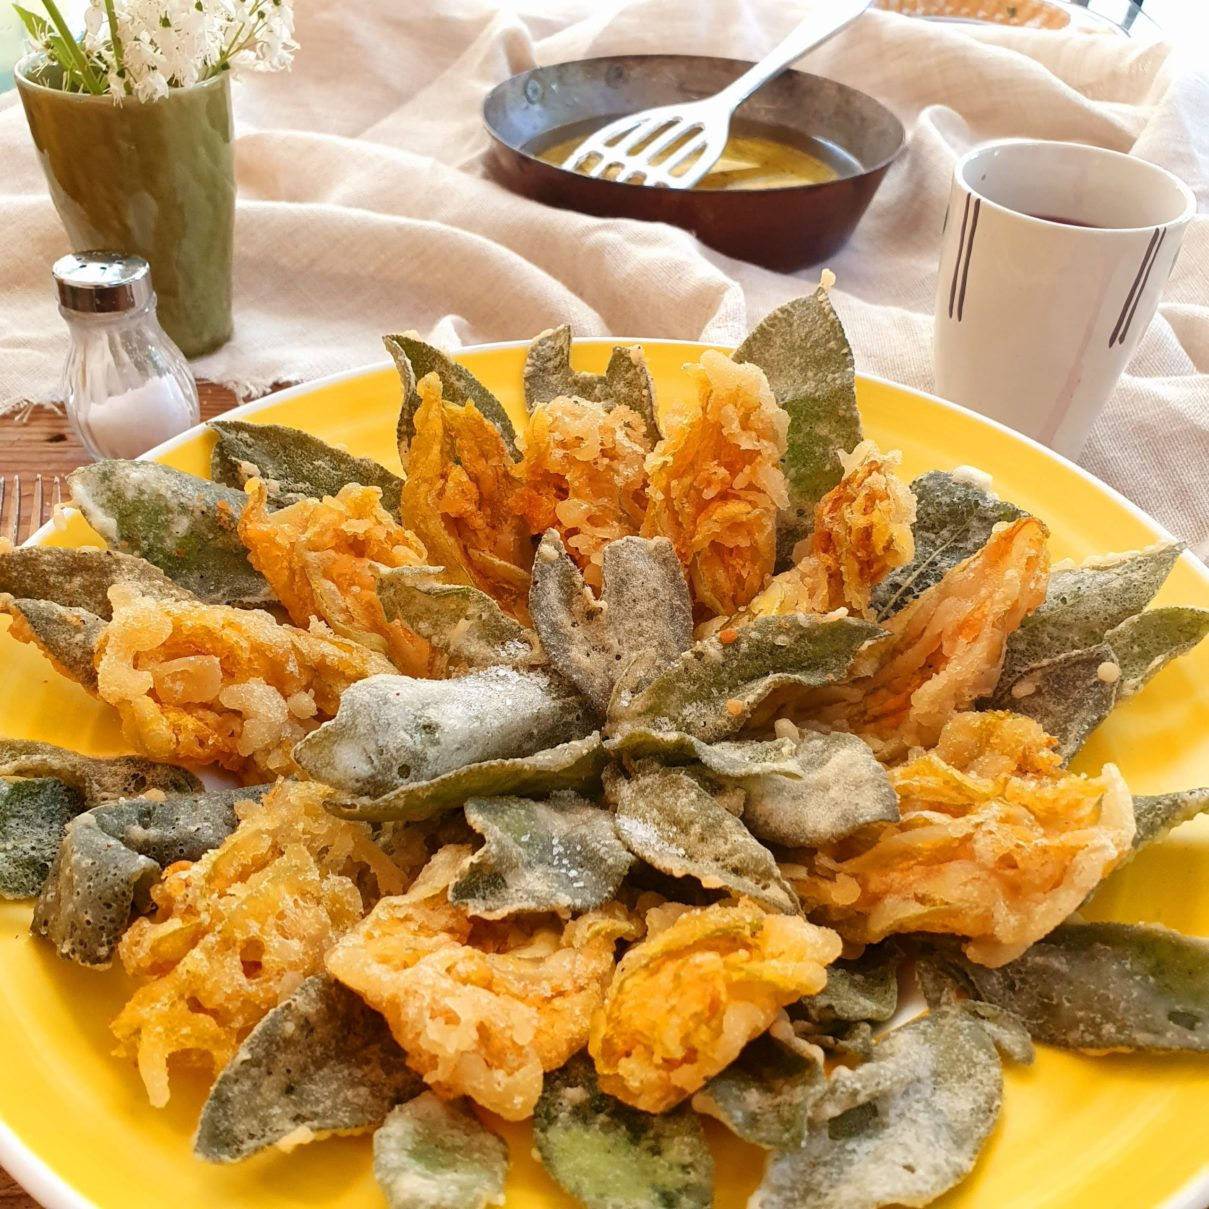 fiori di zucchina e salvia fritta in pastella